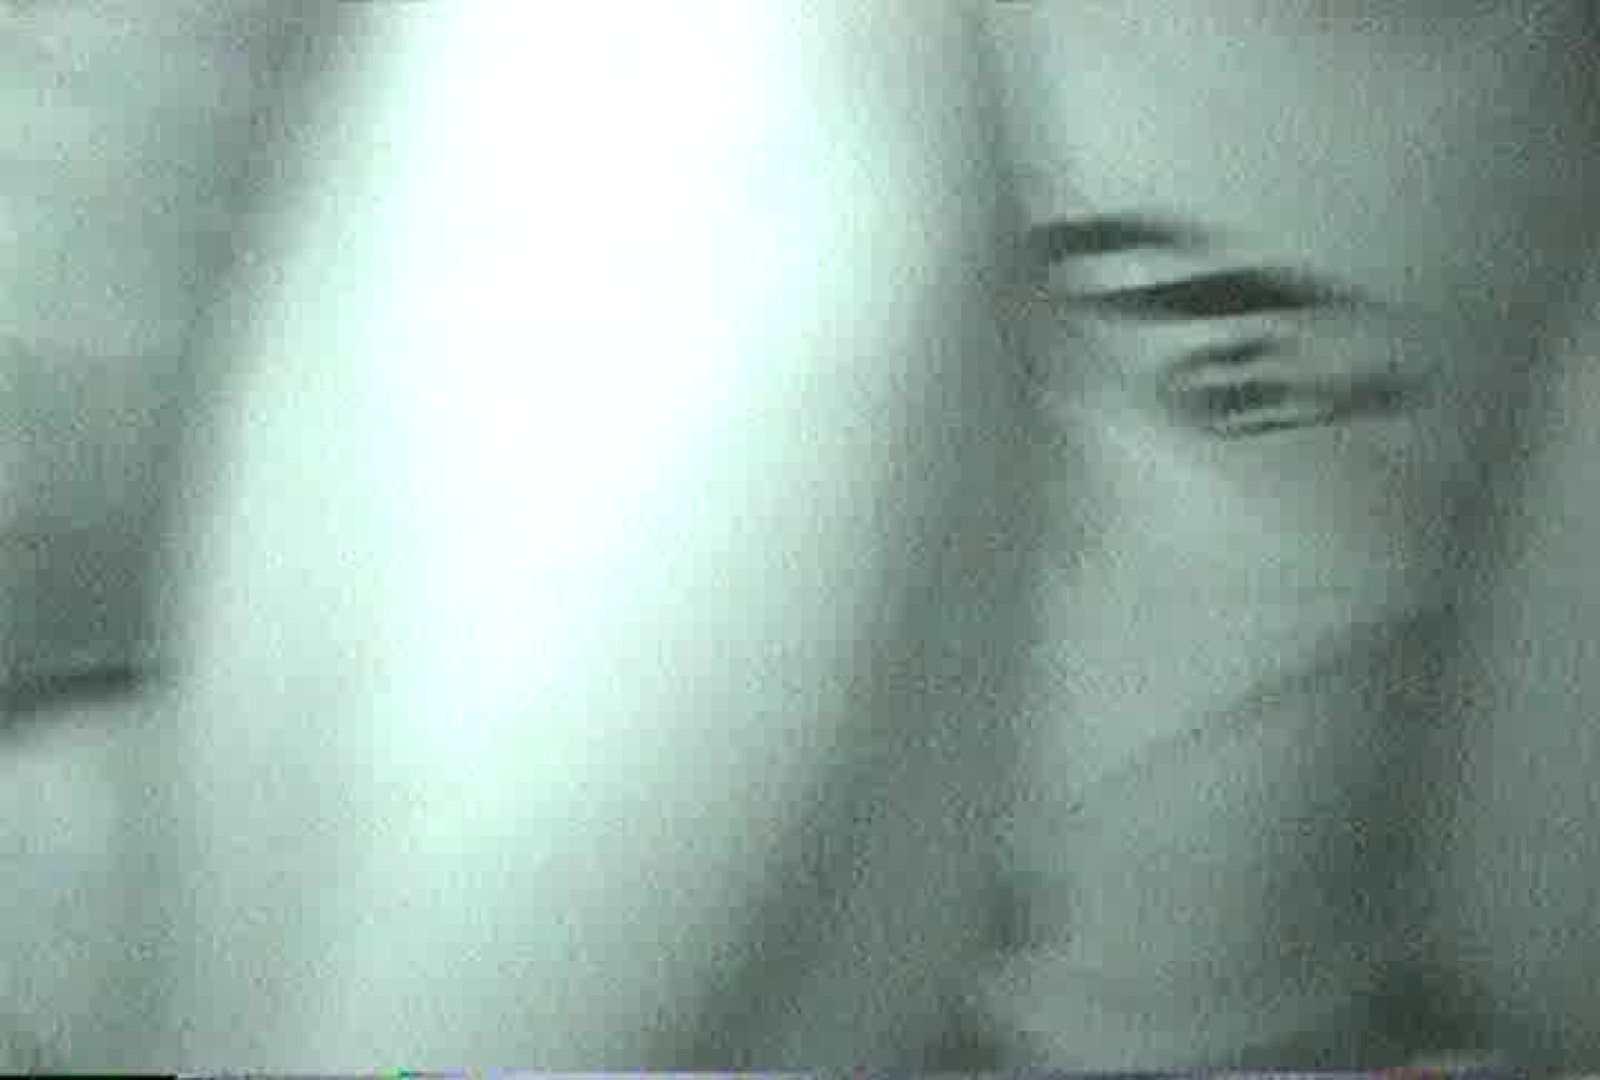 充血監督の深夜の運動会Vol.114 淫乱 セックス無修正動画無料 97画像 26